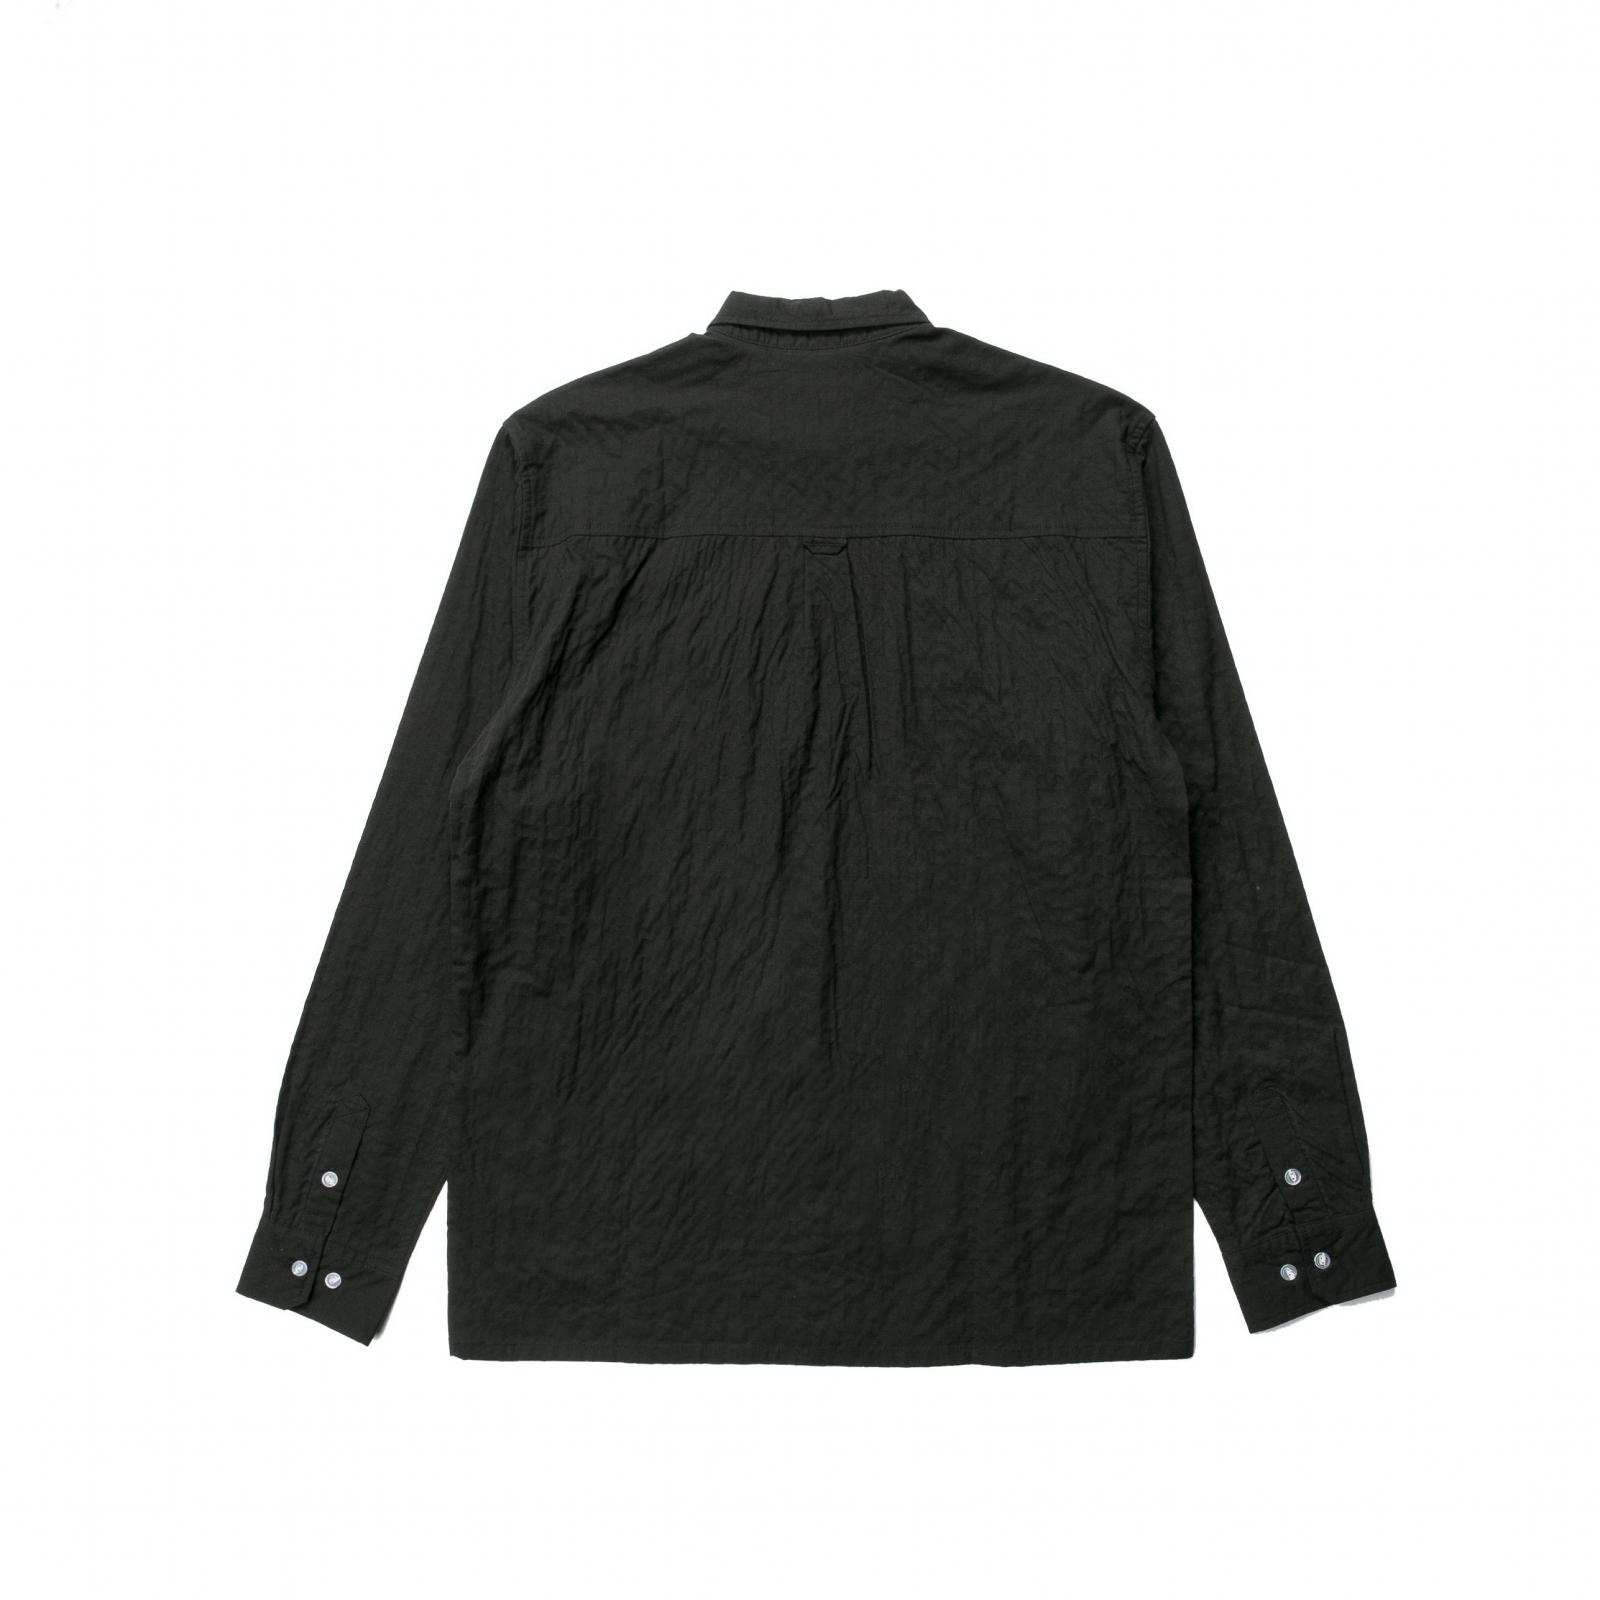 【PUBLISH BRAND/パブリッシュブランド】KOOL 長袖シャツ / BLACK